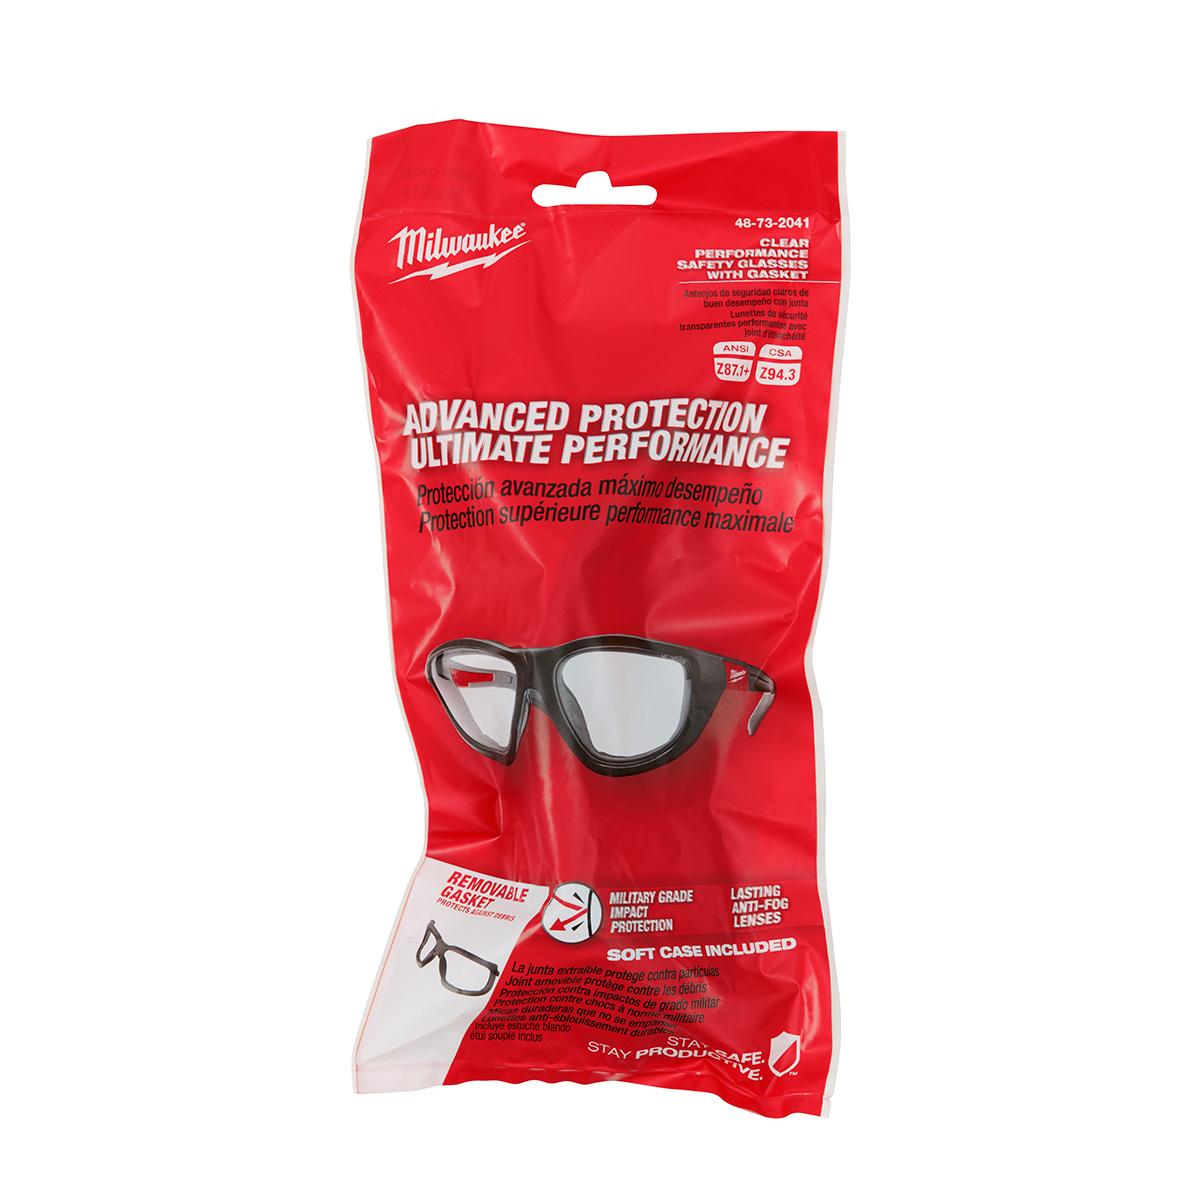 MILWAUKEE 48-73-2041 HI PERFORM CLEAR GLASSES W/GASKET